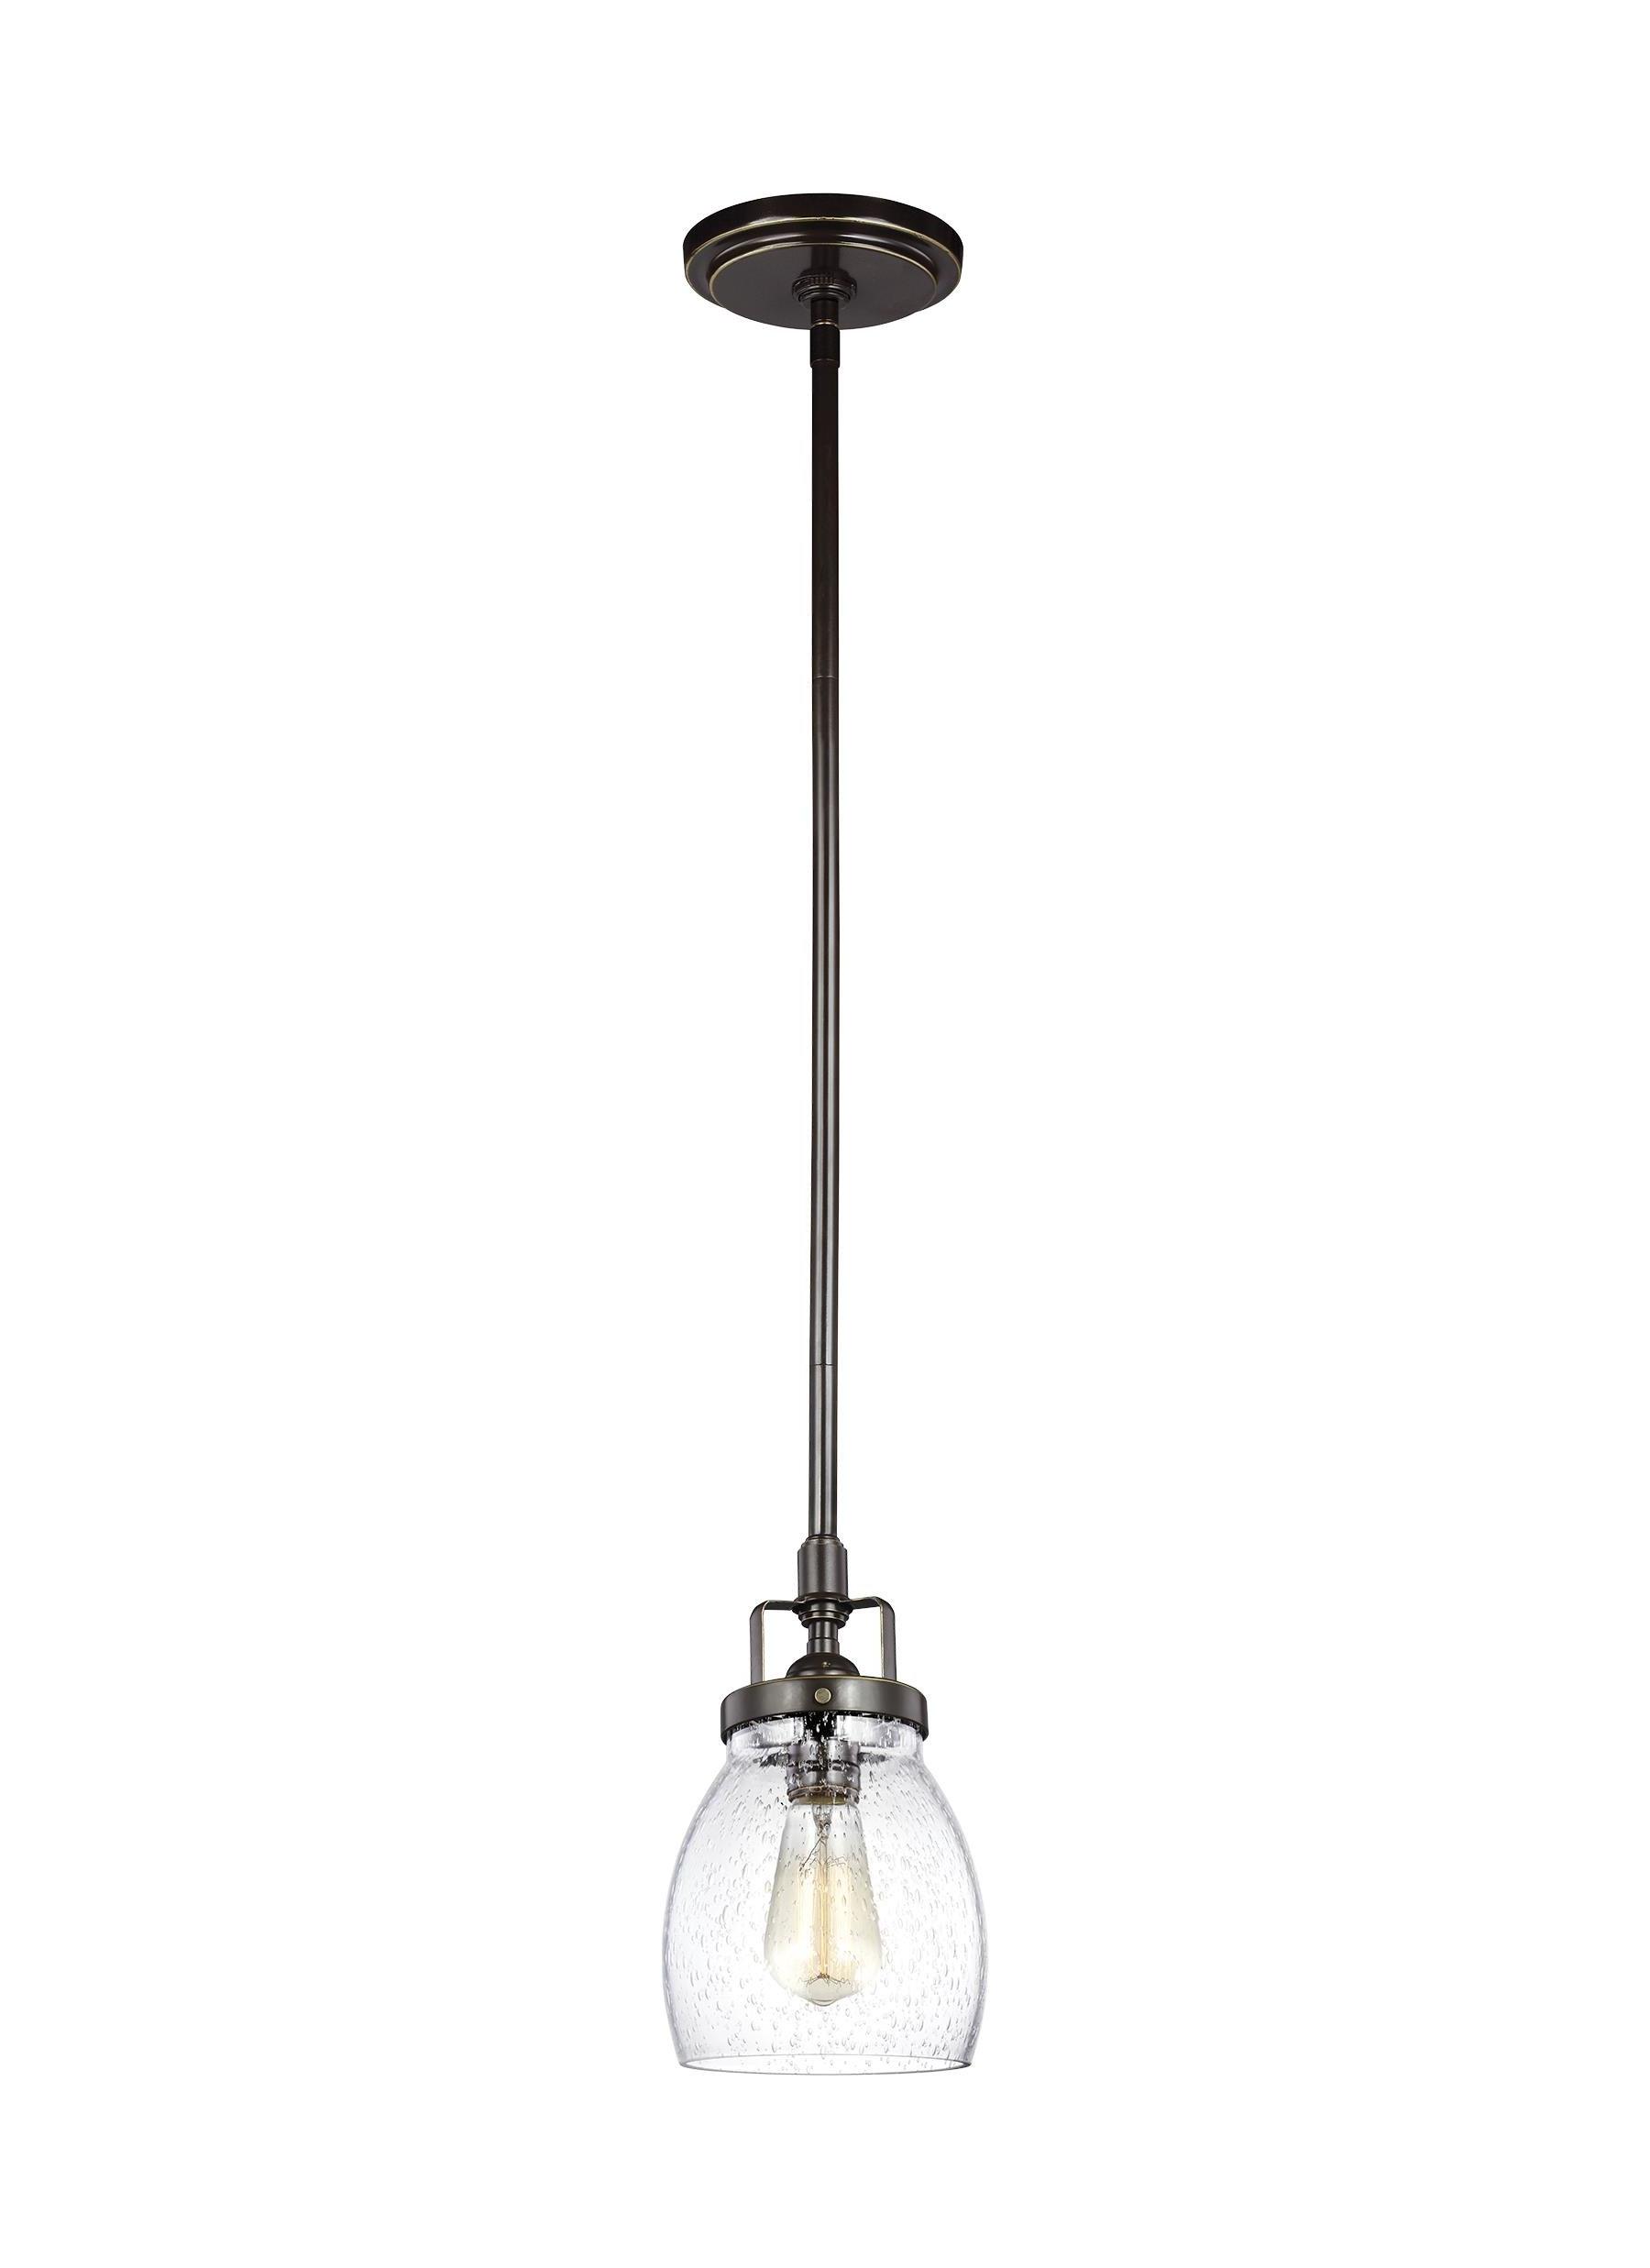 Trent Austin Design Houon Heirloom Bronze 1 Light Cone Bell Pendant Regarding Latest Terry 1 Light Single Bell Pendants (View 20 of 25)